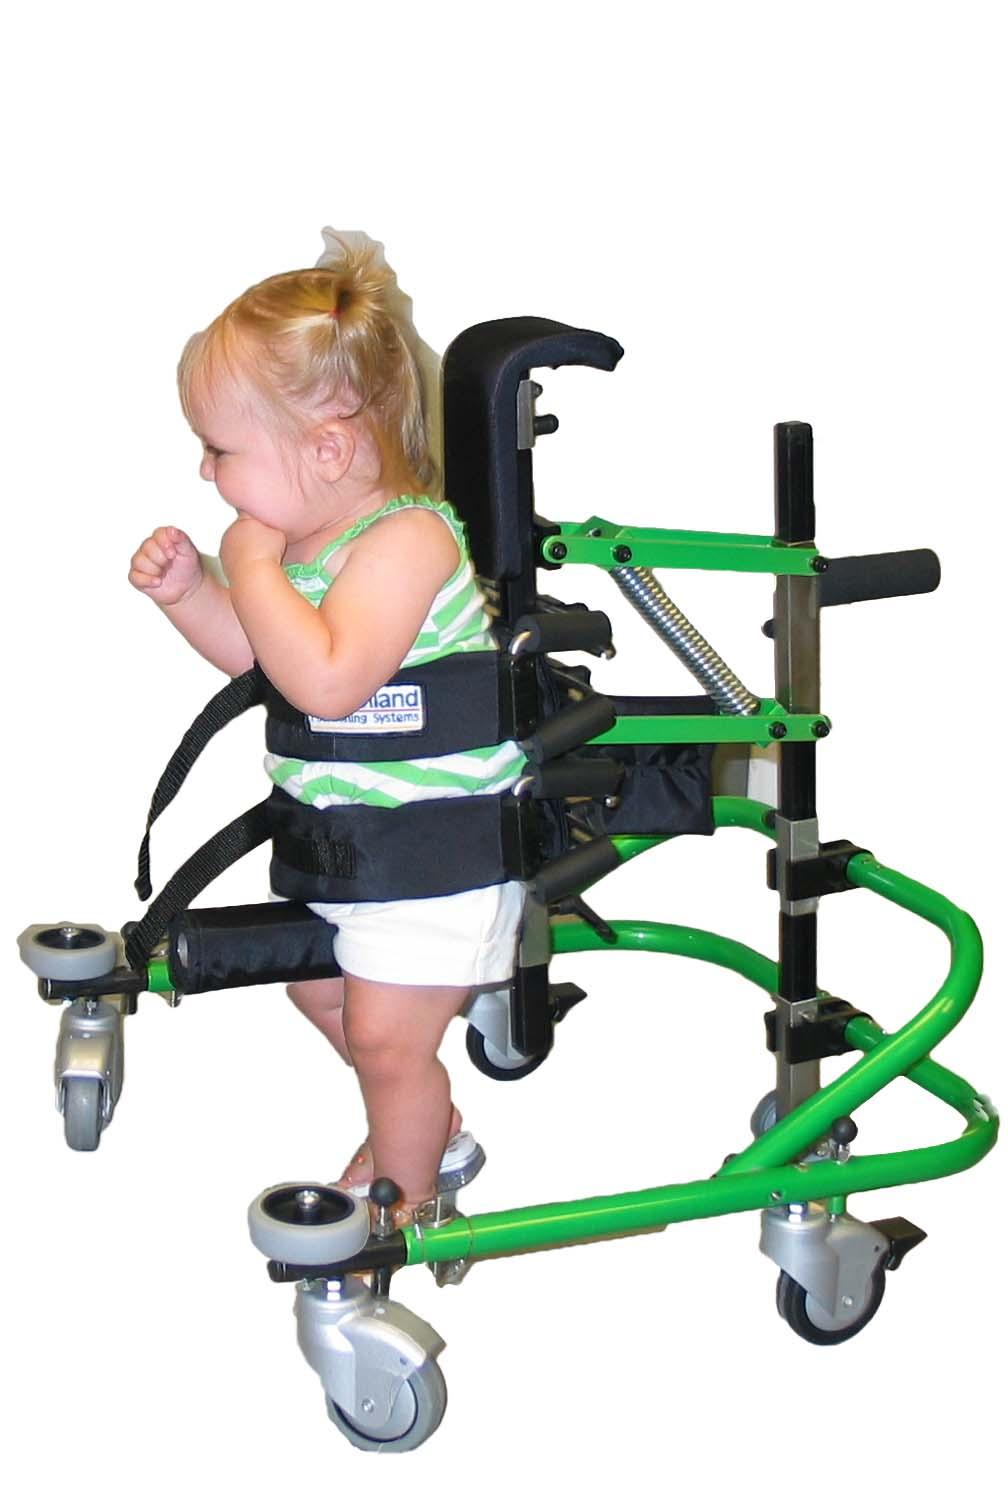 Durable Medical Equipment Clipart - Clipart Kid